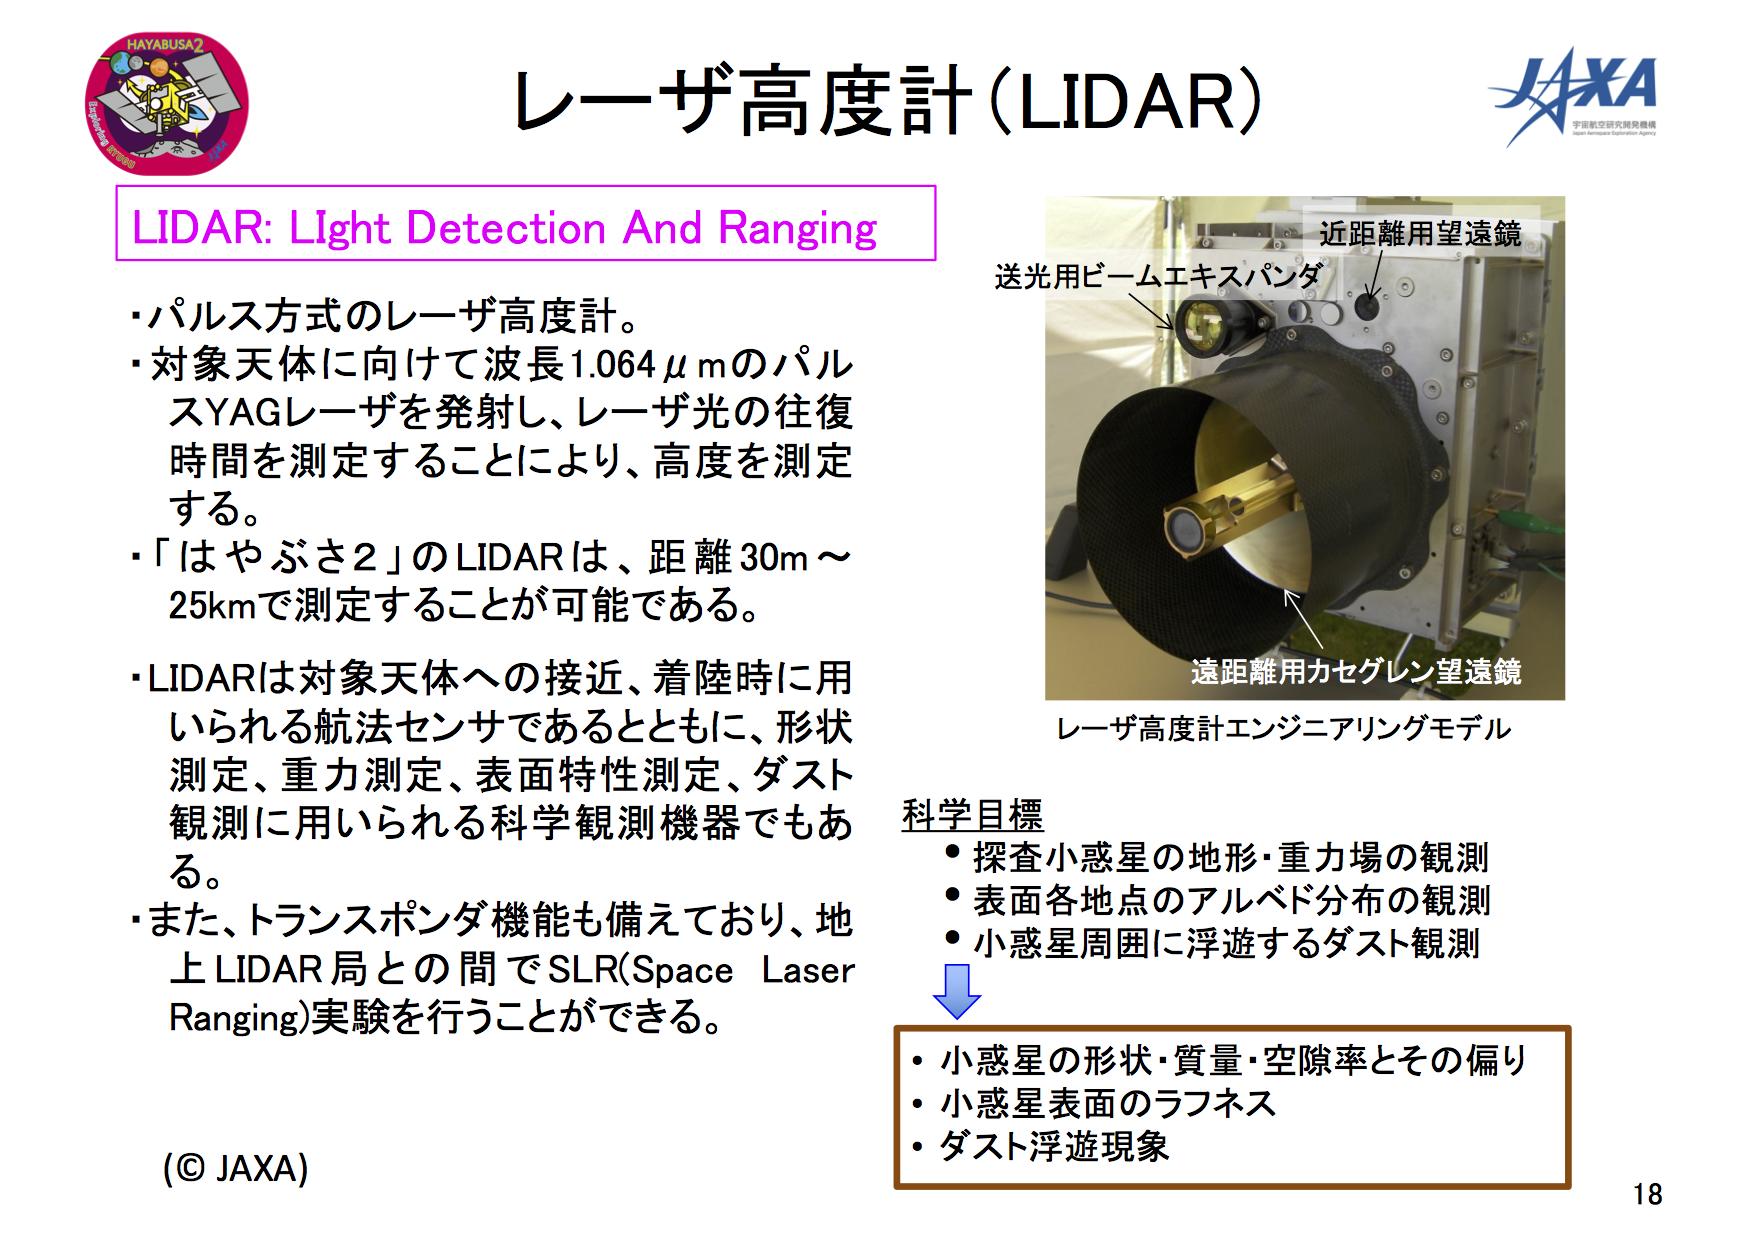 f:id:Imamura:20180921145508p:plain